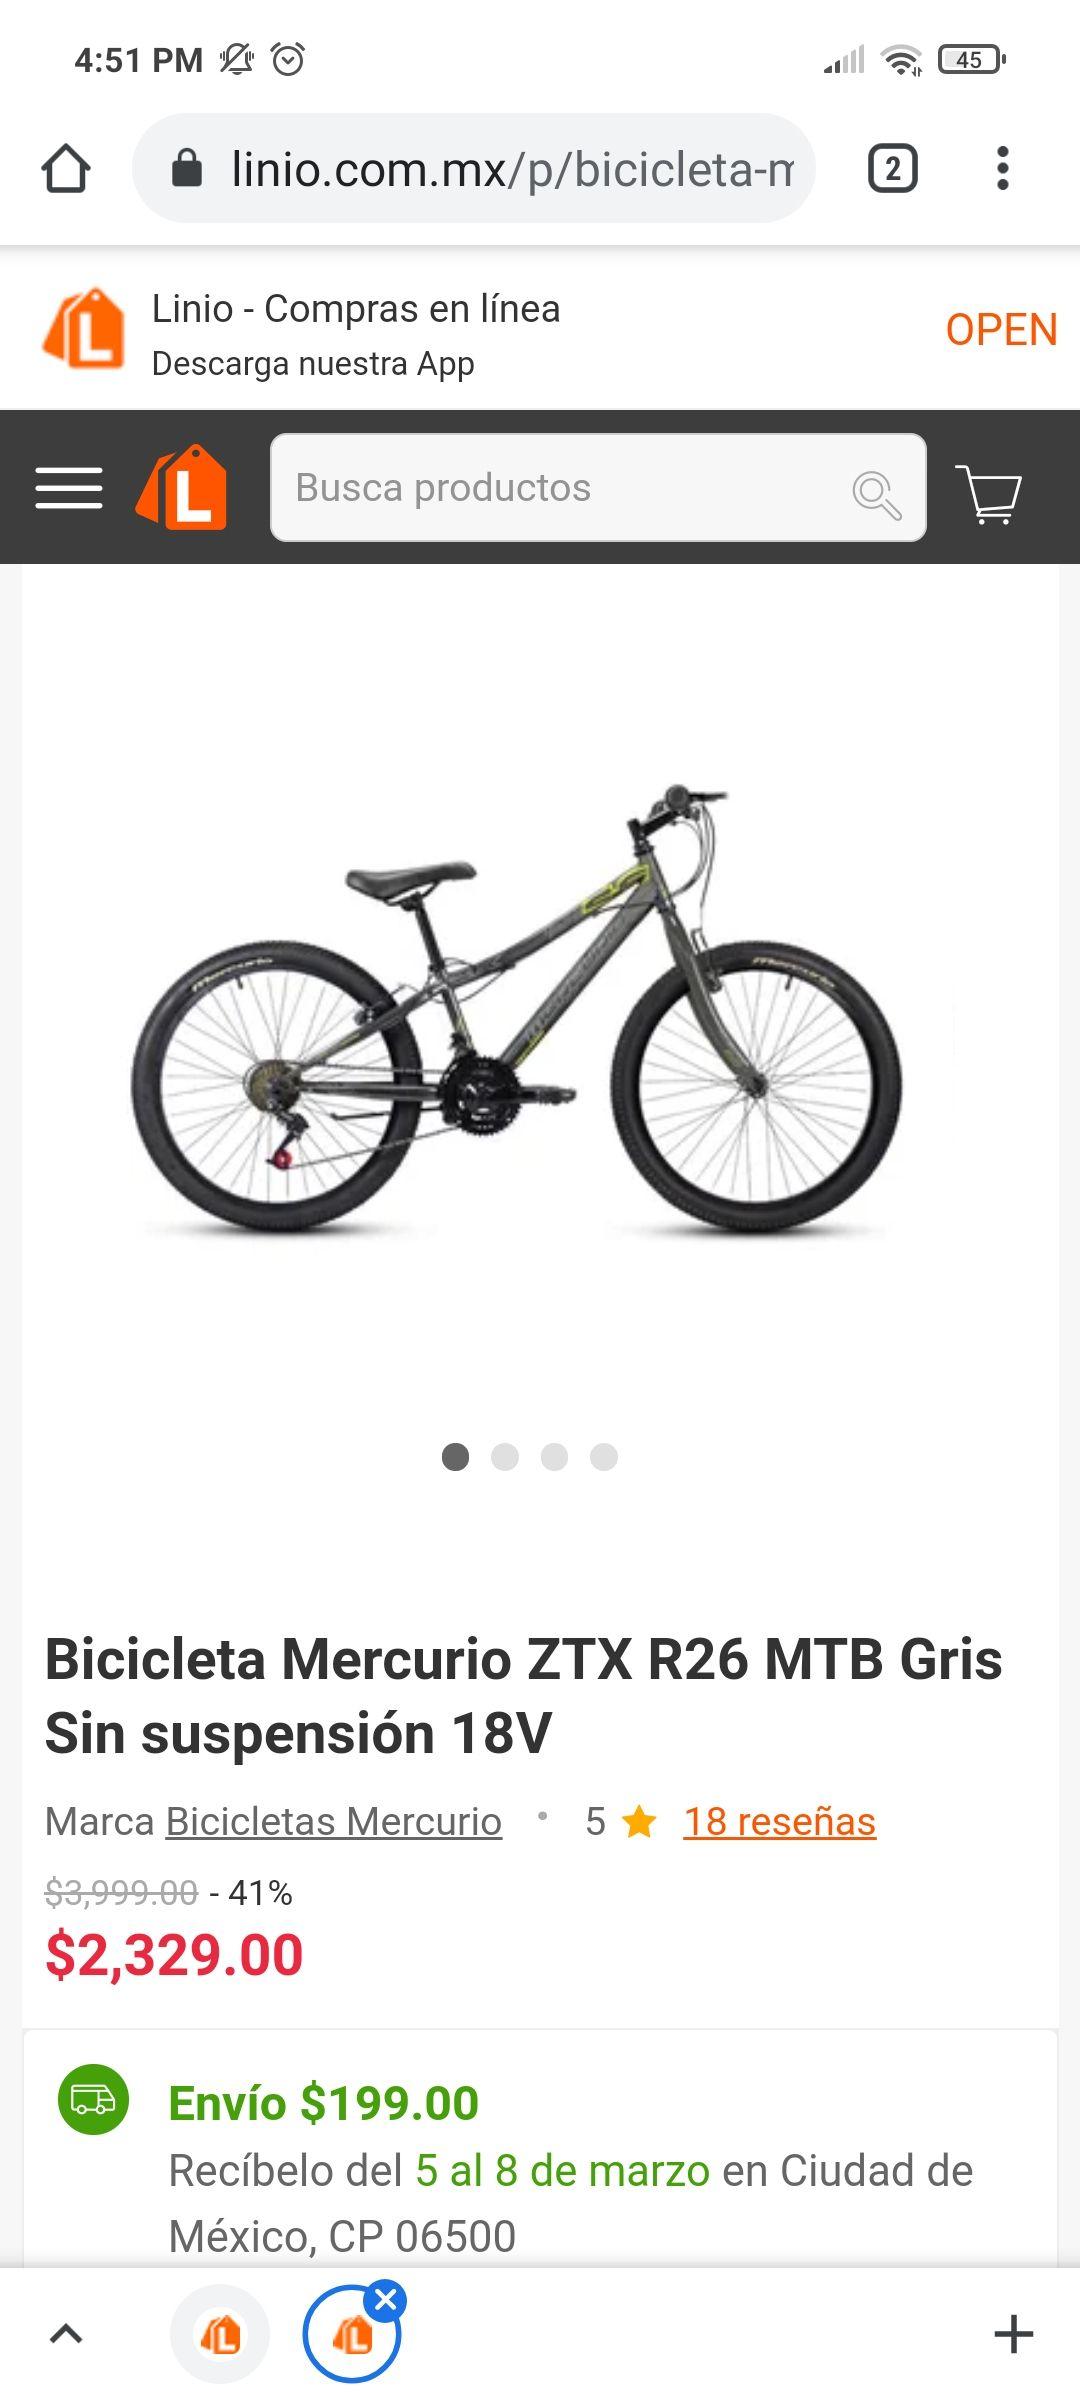 Linio: Bicicleta Mercurio ZTX R26 MTB